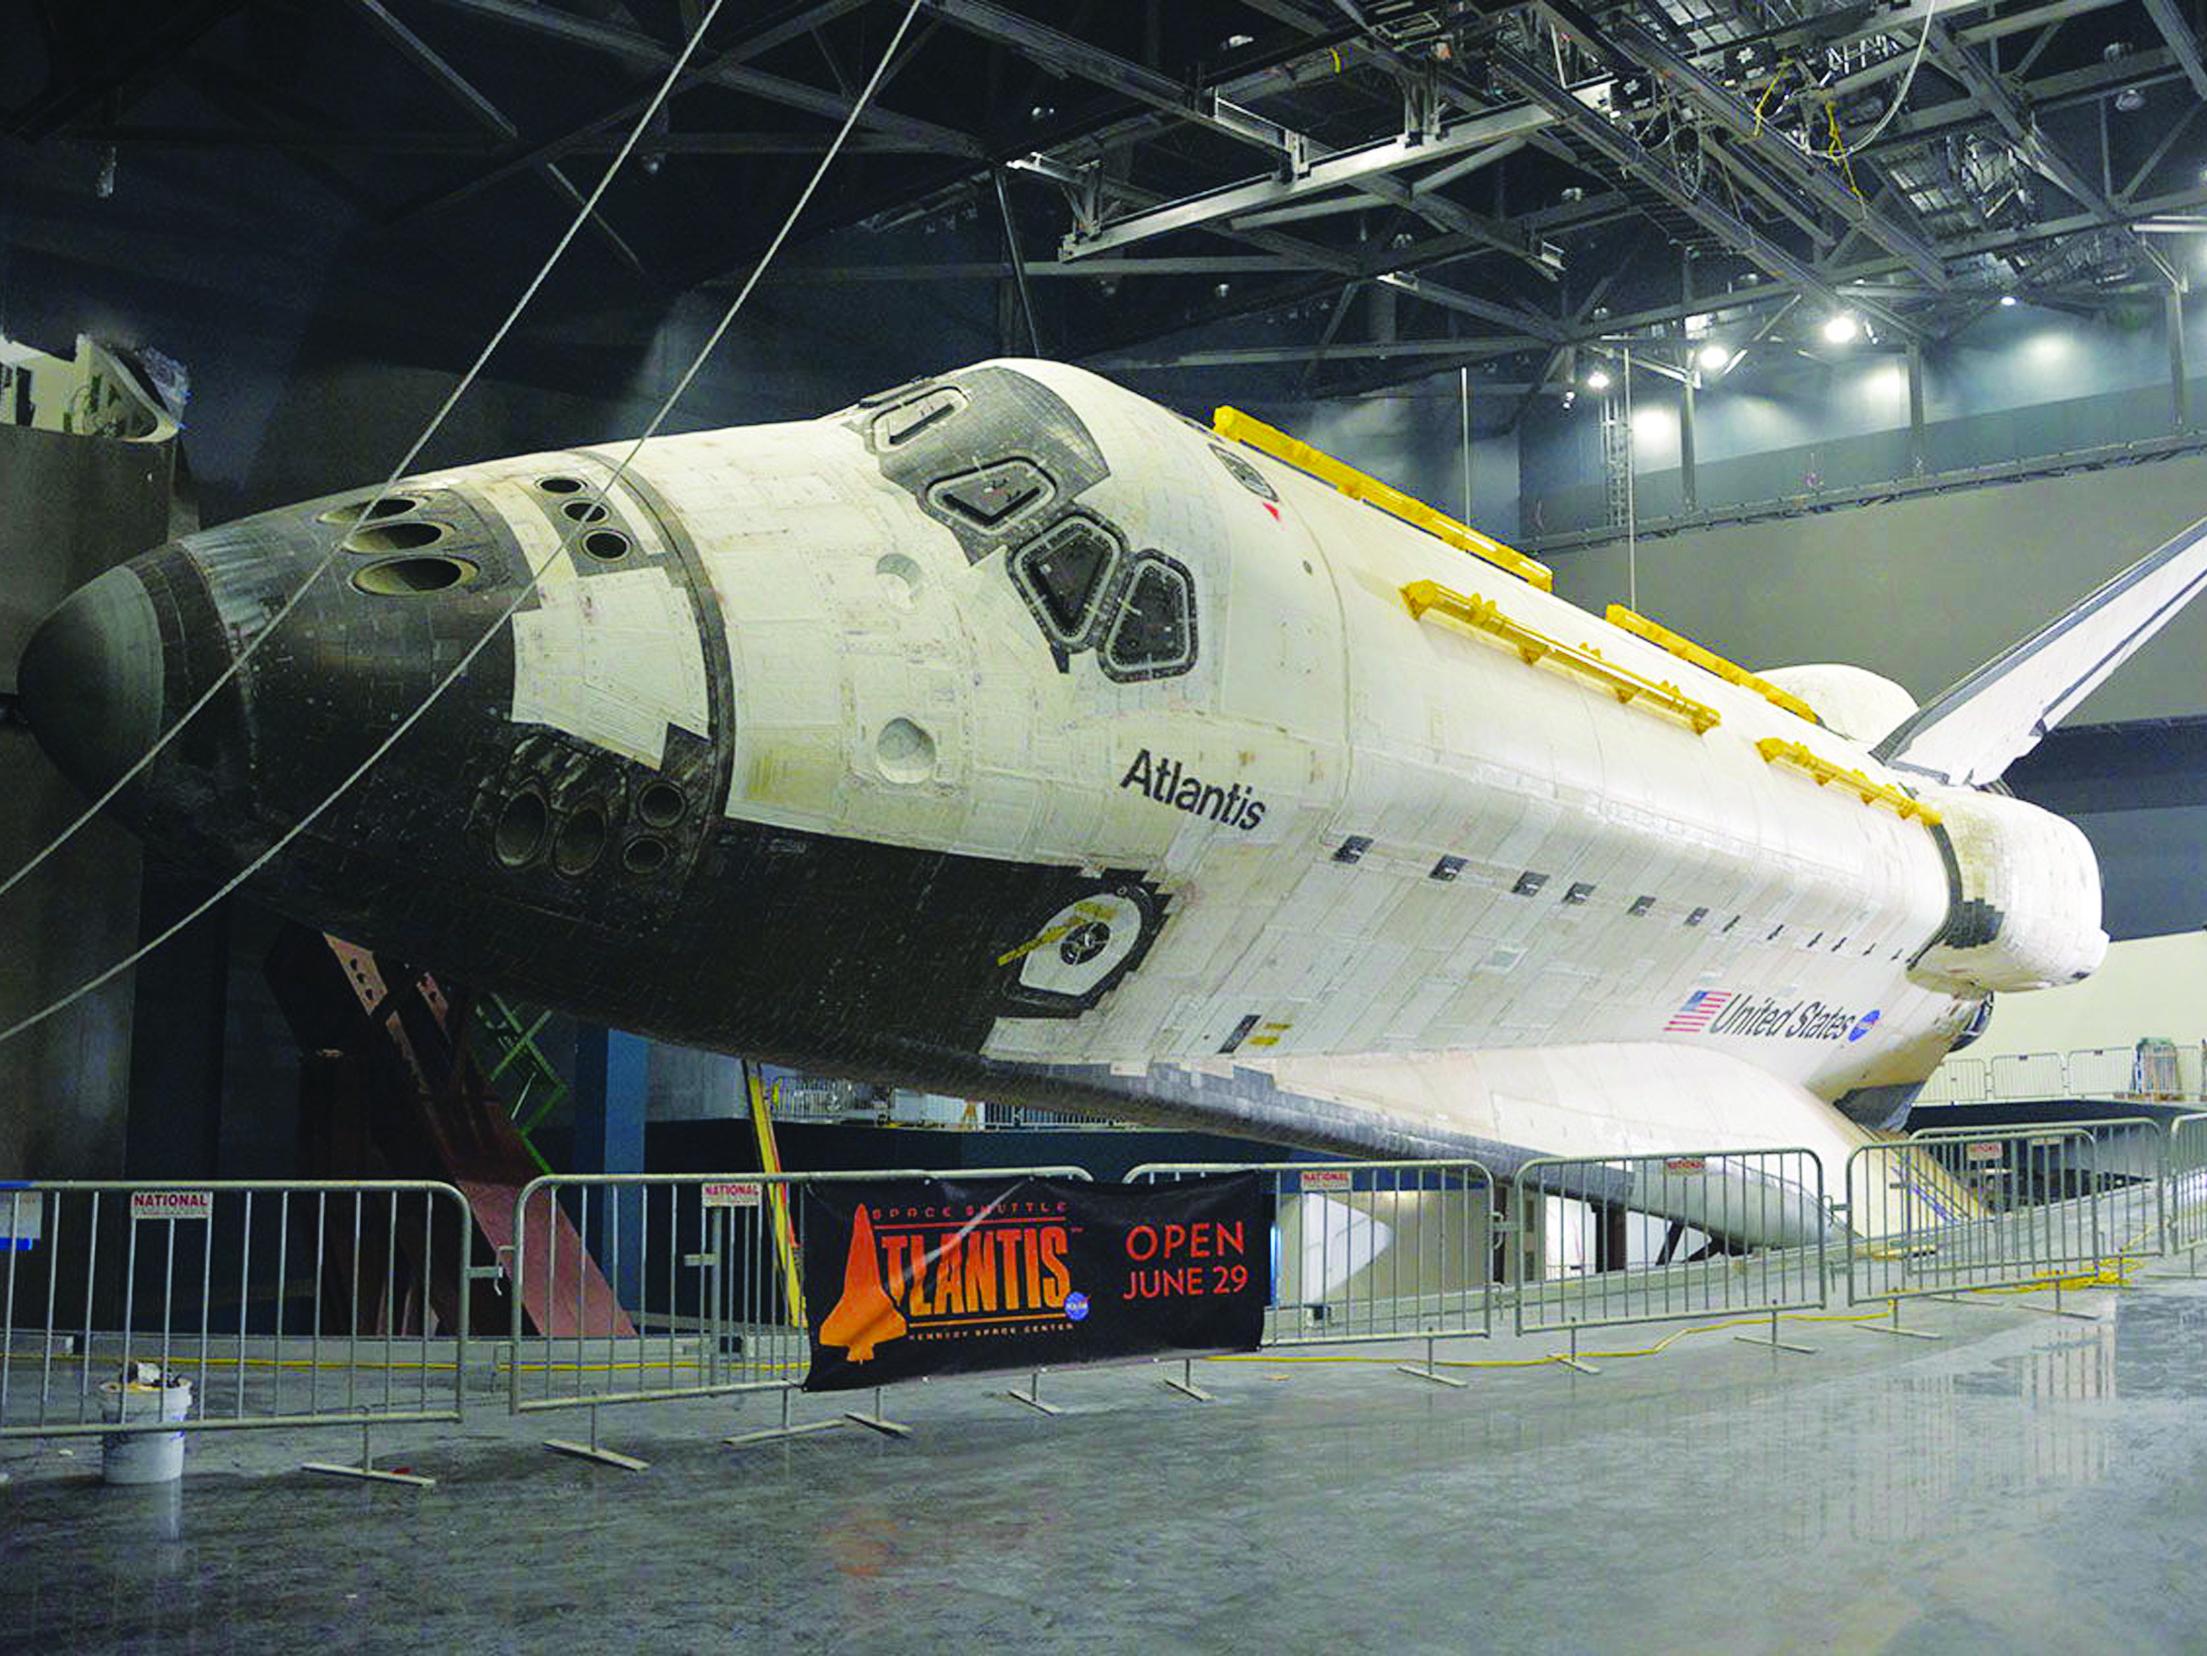 space shuttle atlantis - HD1024×768